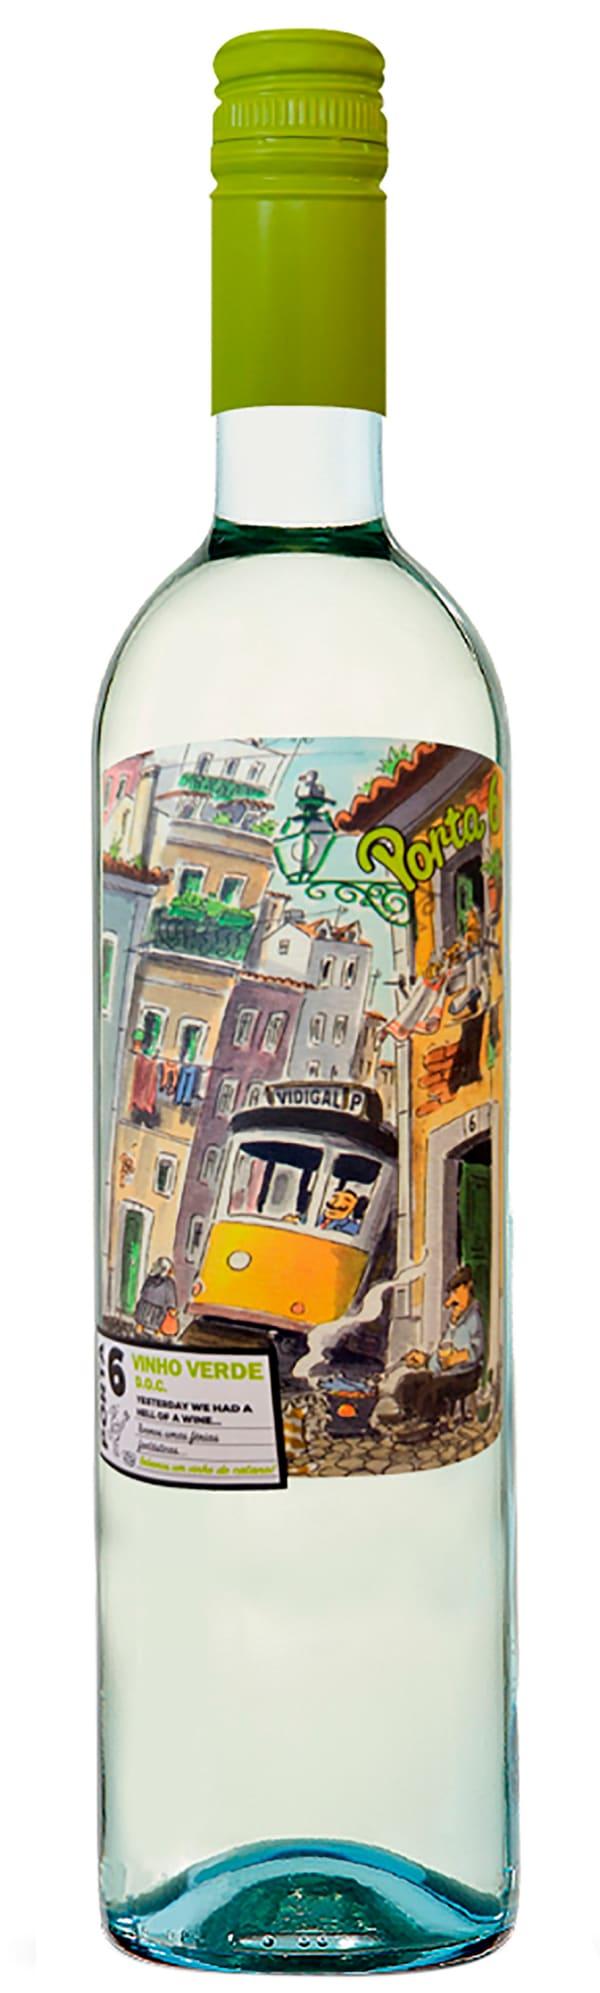 Porta 6 Vinho Verde 2019